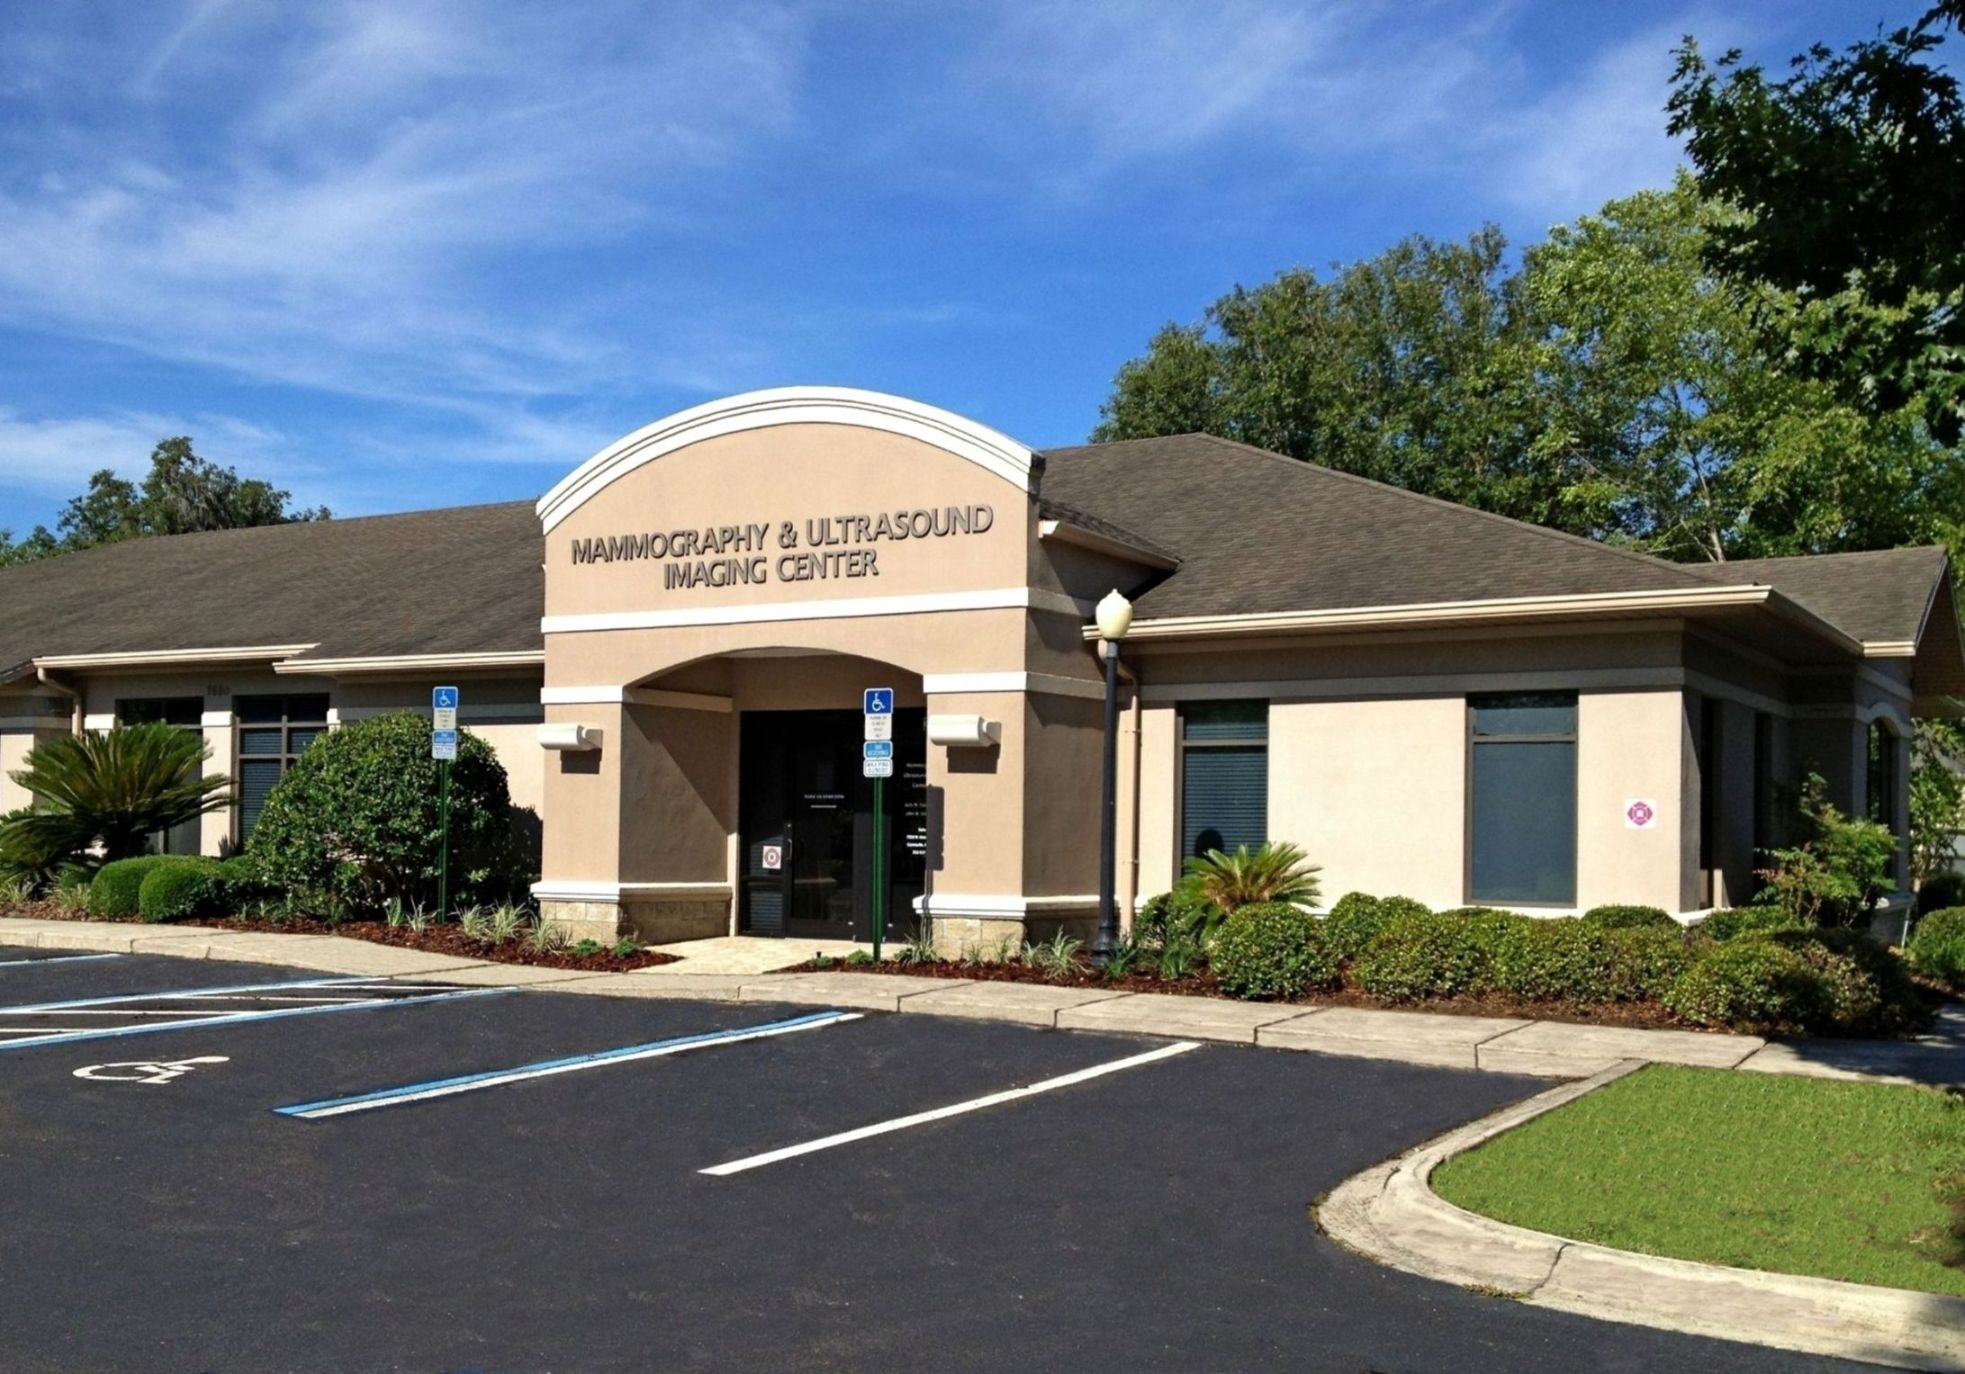 Mammography & Ultrasound Imaging Center (MUSIC, PLLC)